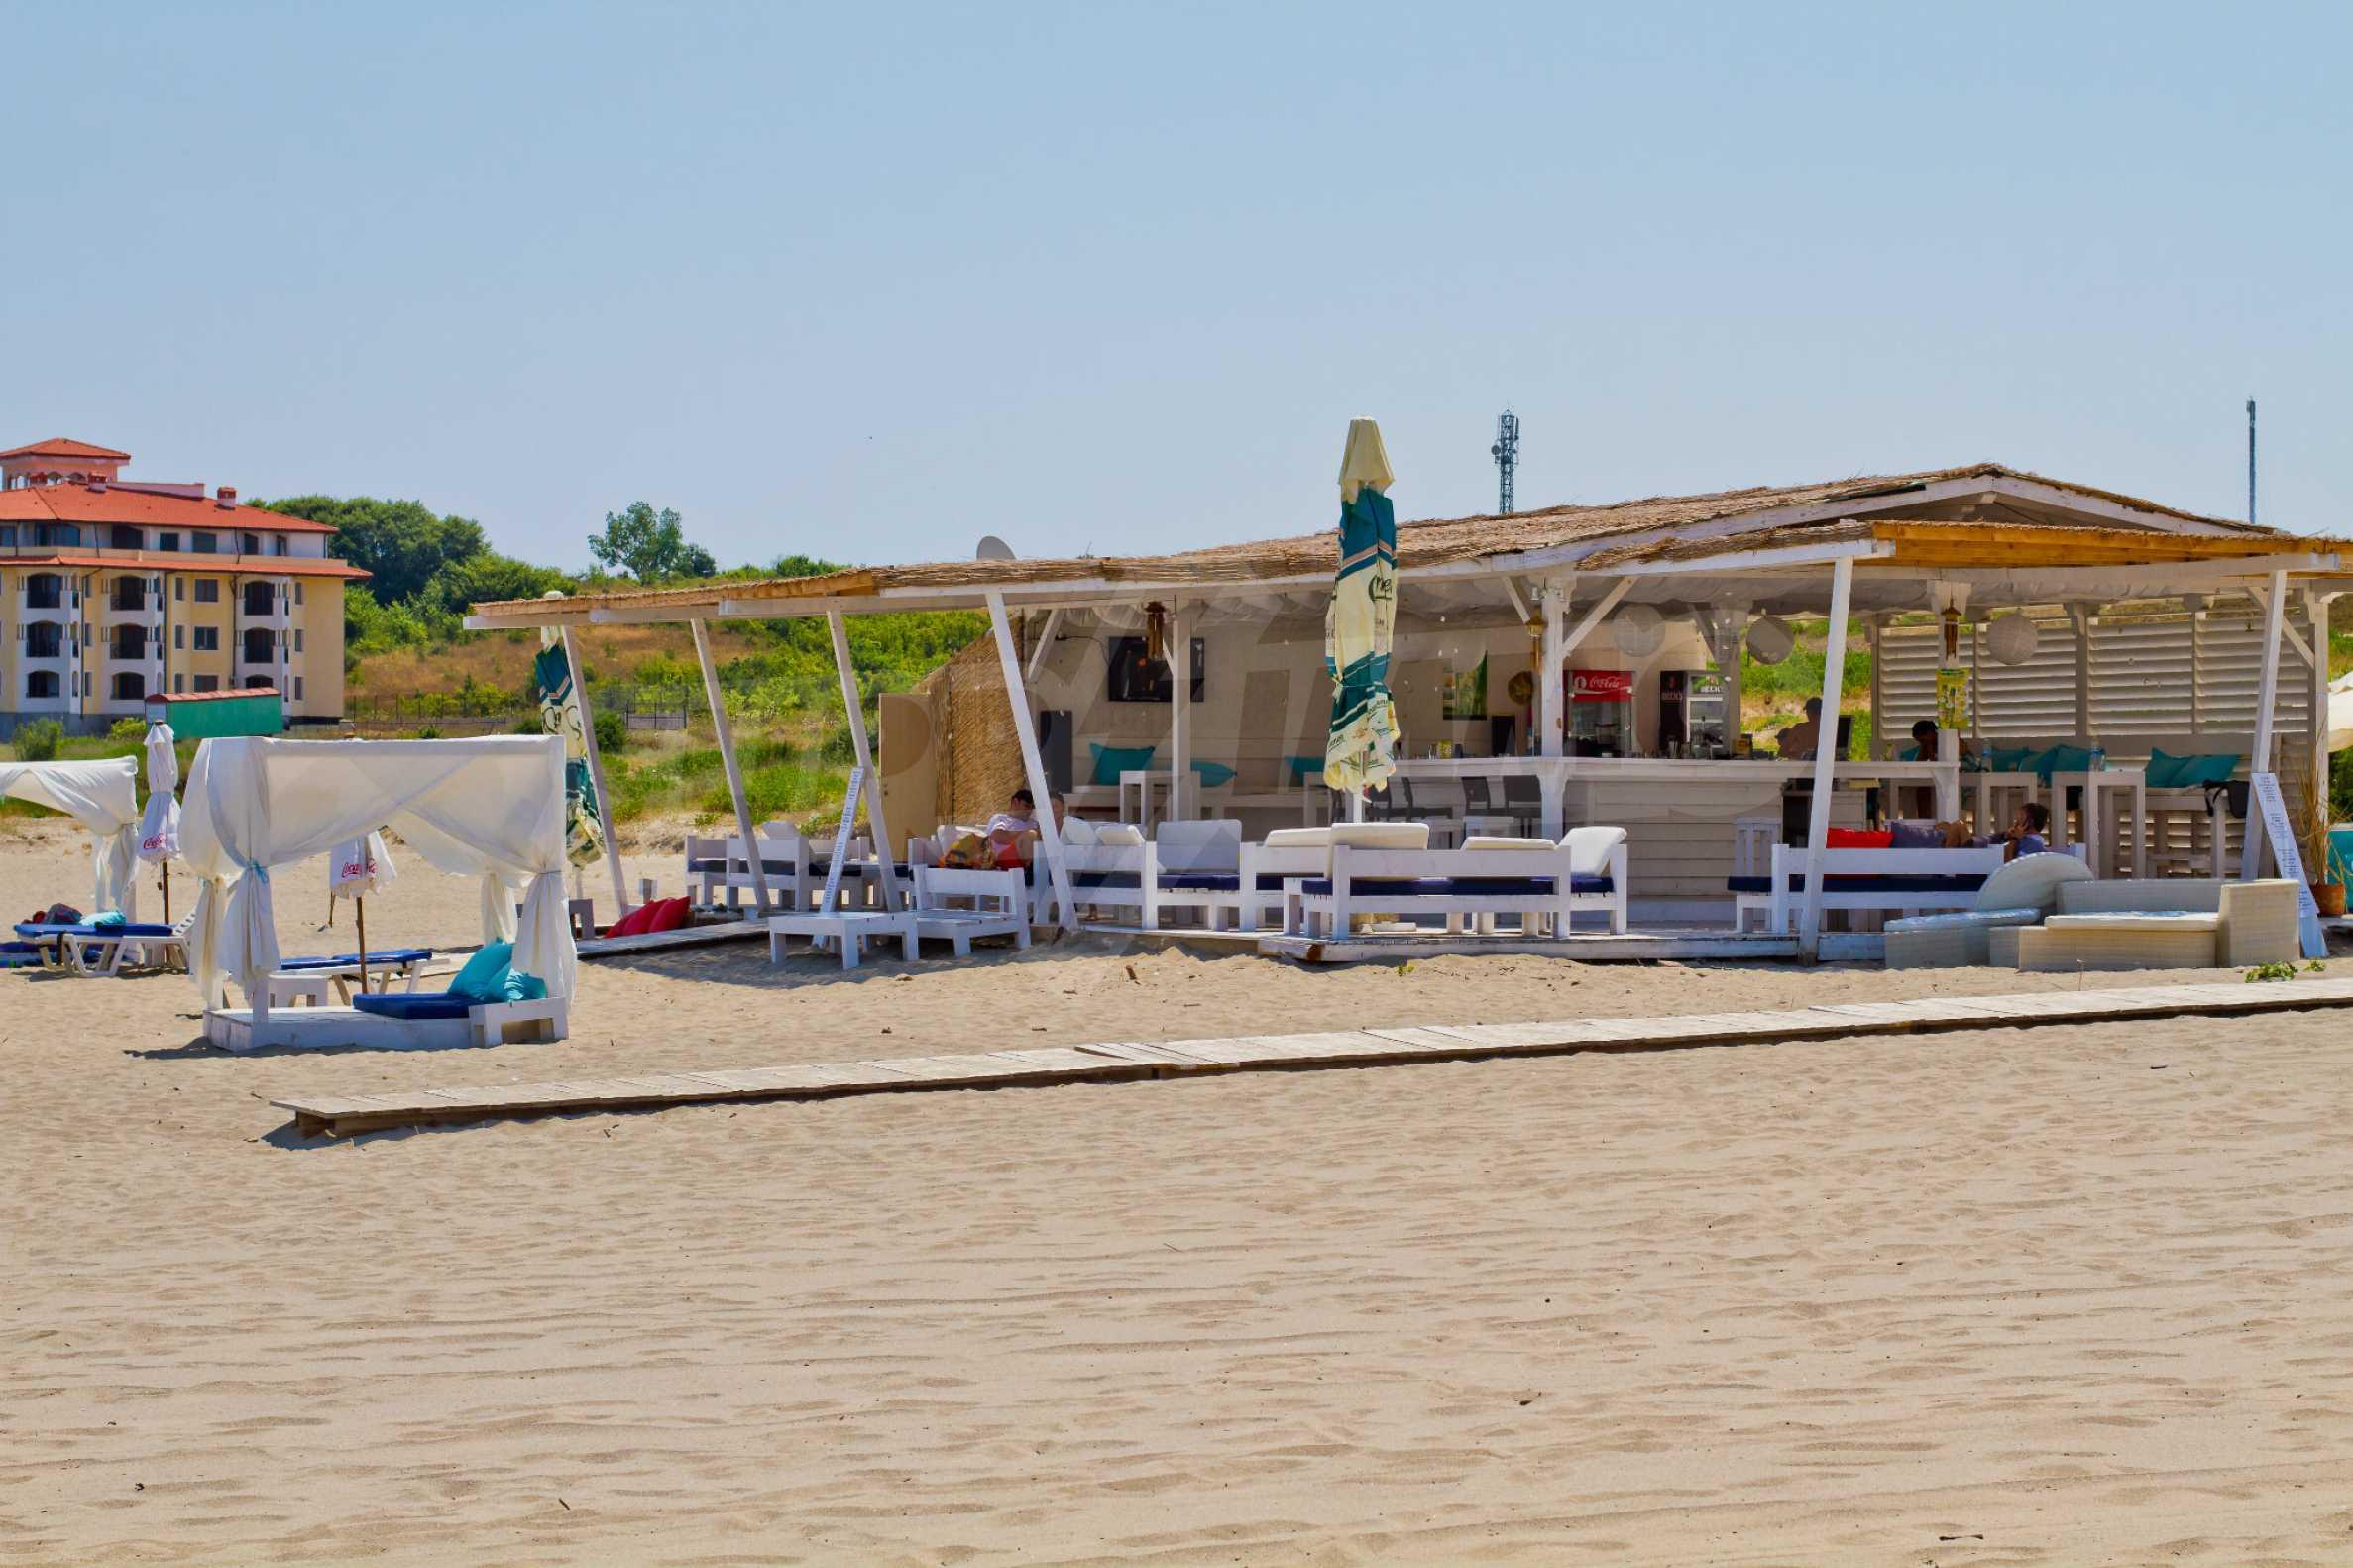 Примеа Бийч Резиденс / Primea Beach Residence 9